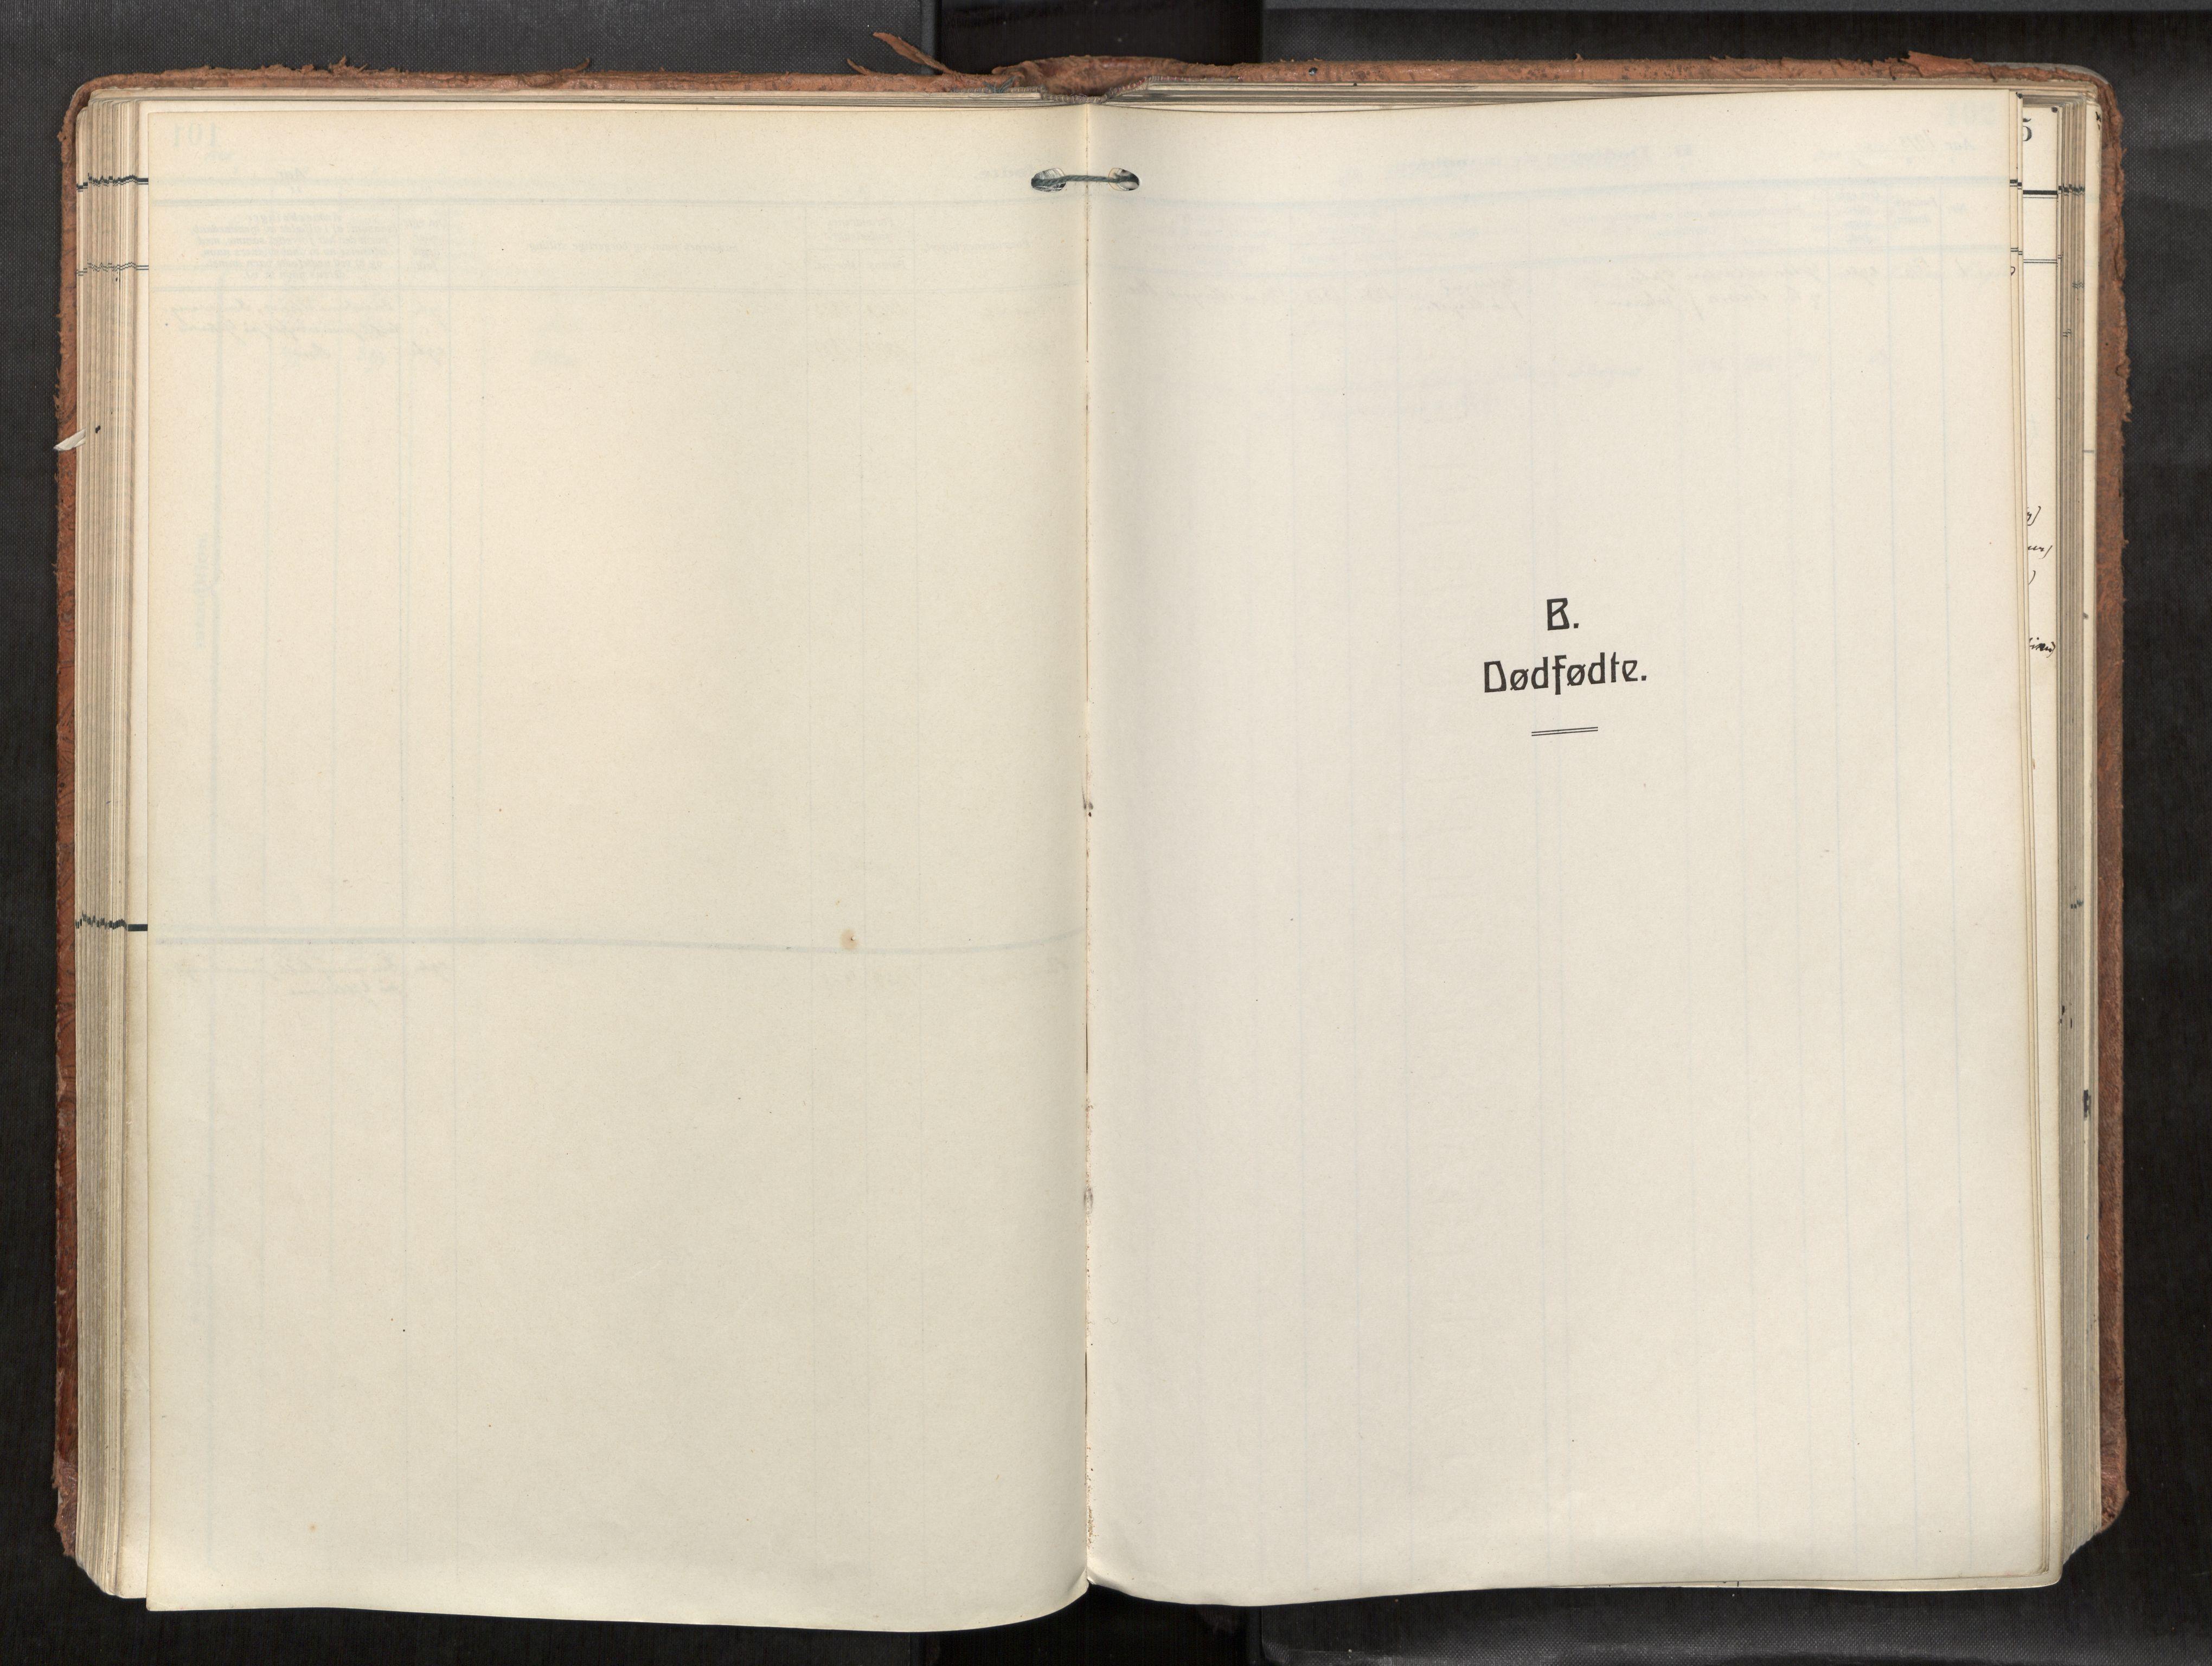 SAT, Levanger sokneprestkontor*, Parish register (official) no. 1, 1912-1935